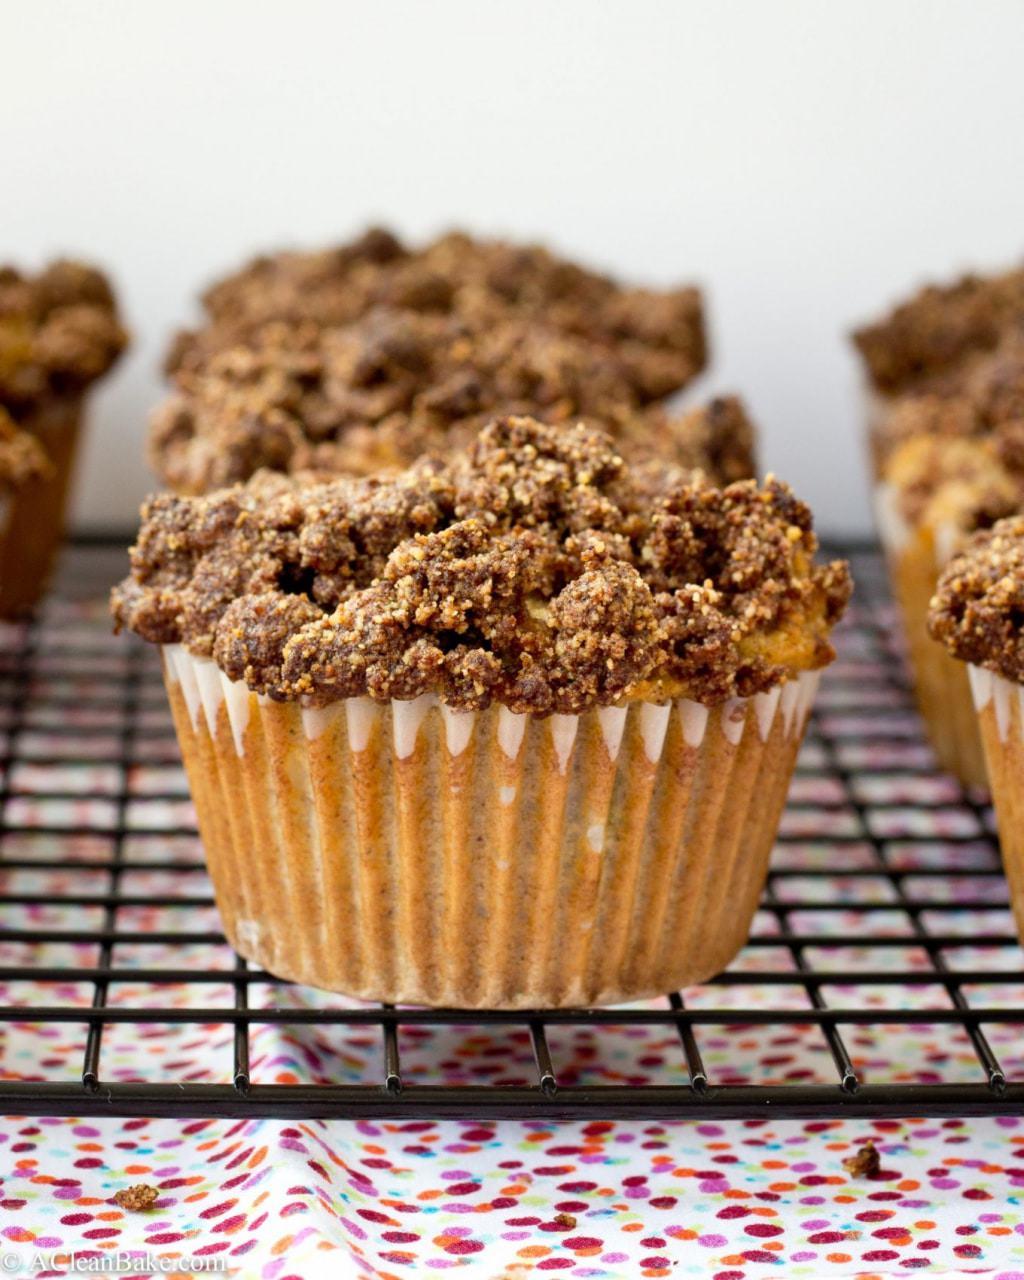 Rhubarb Coffee Cake Muffins (Gluten Free and Paleo)